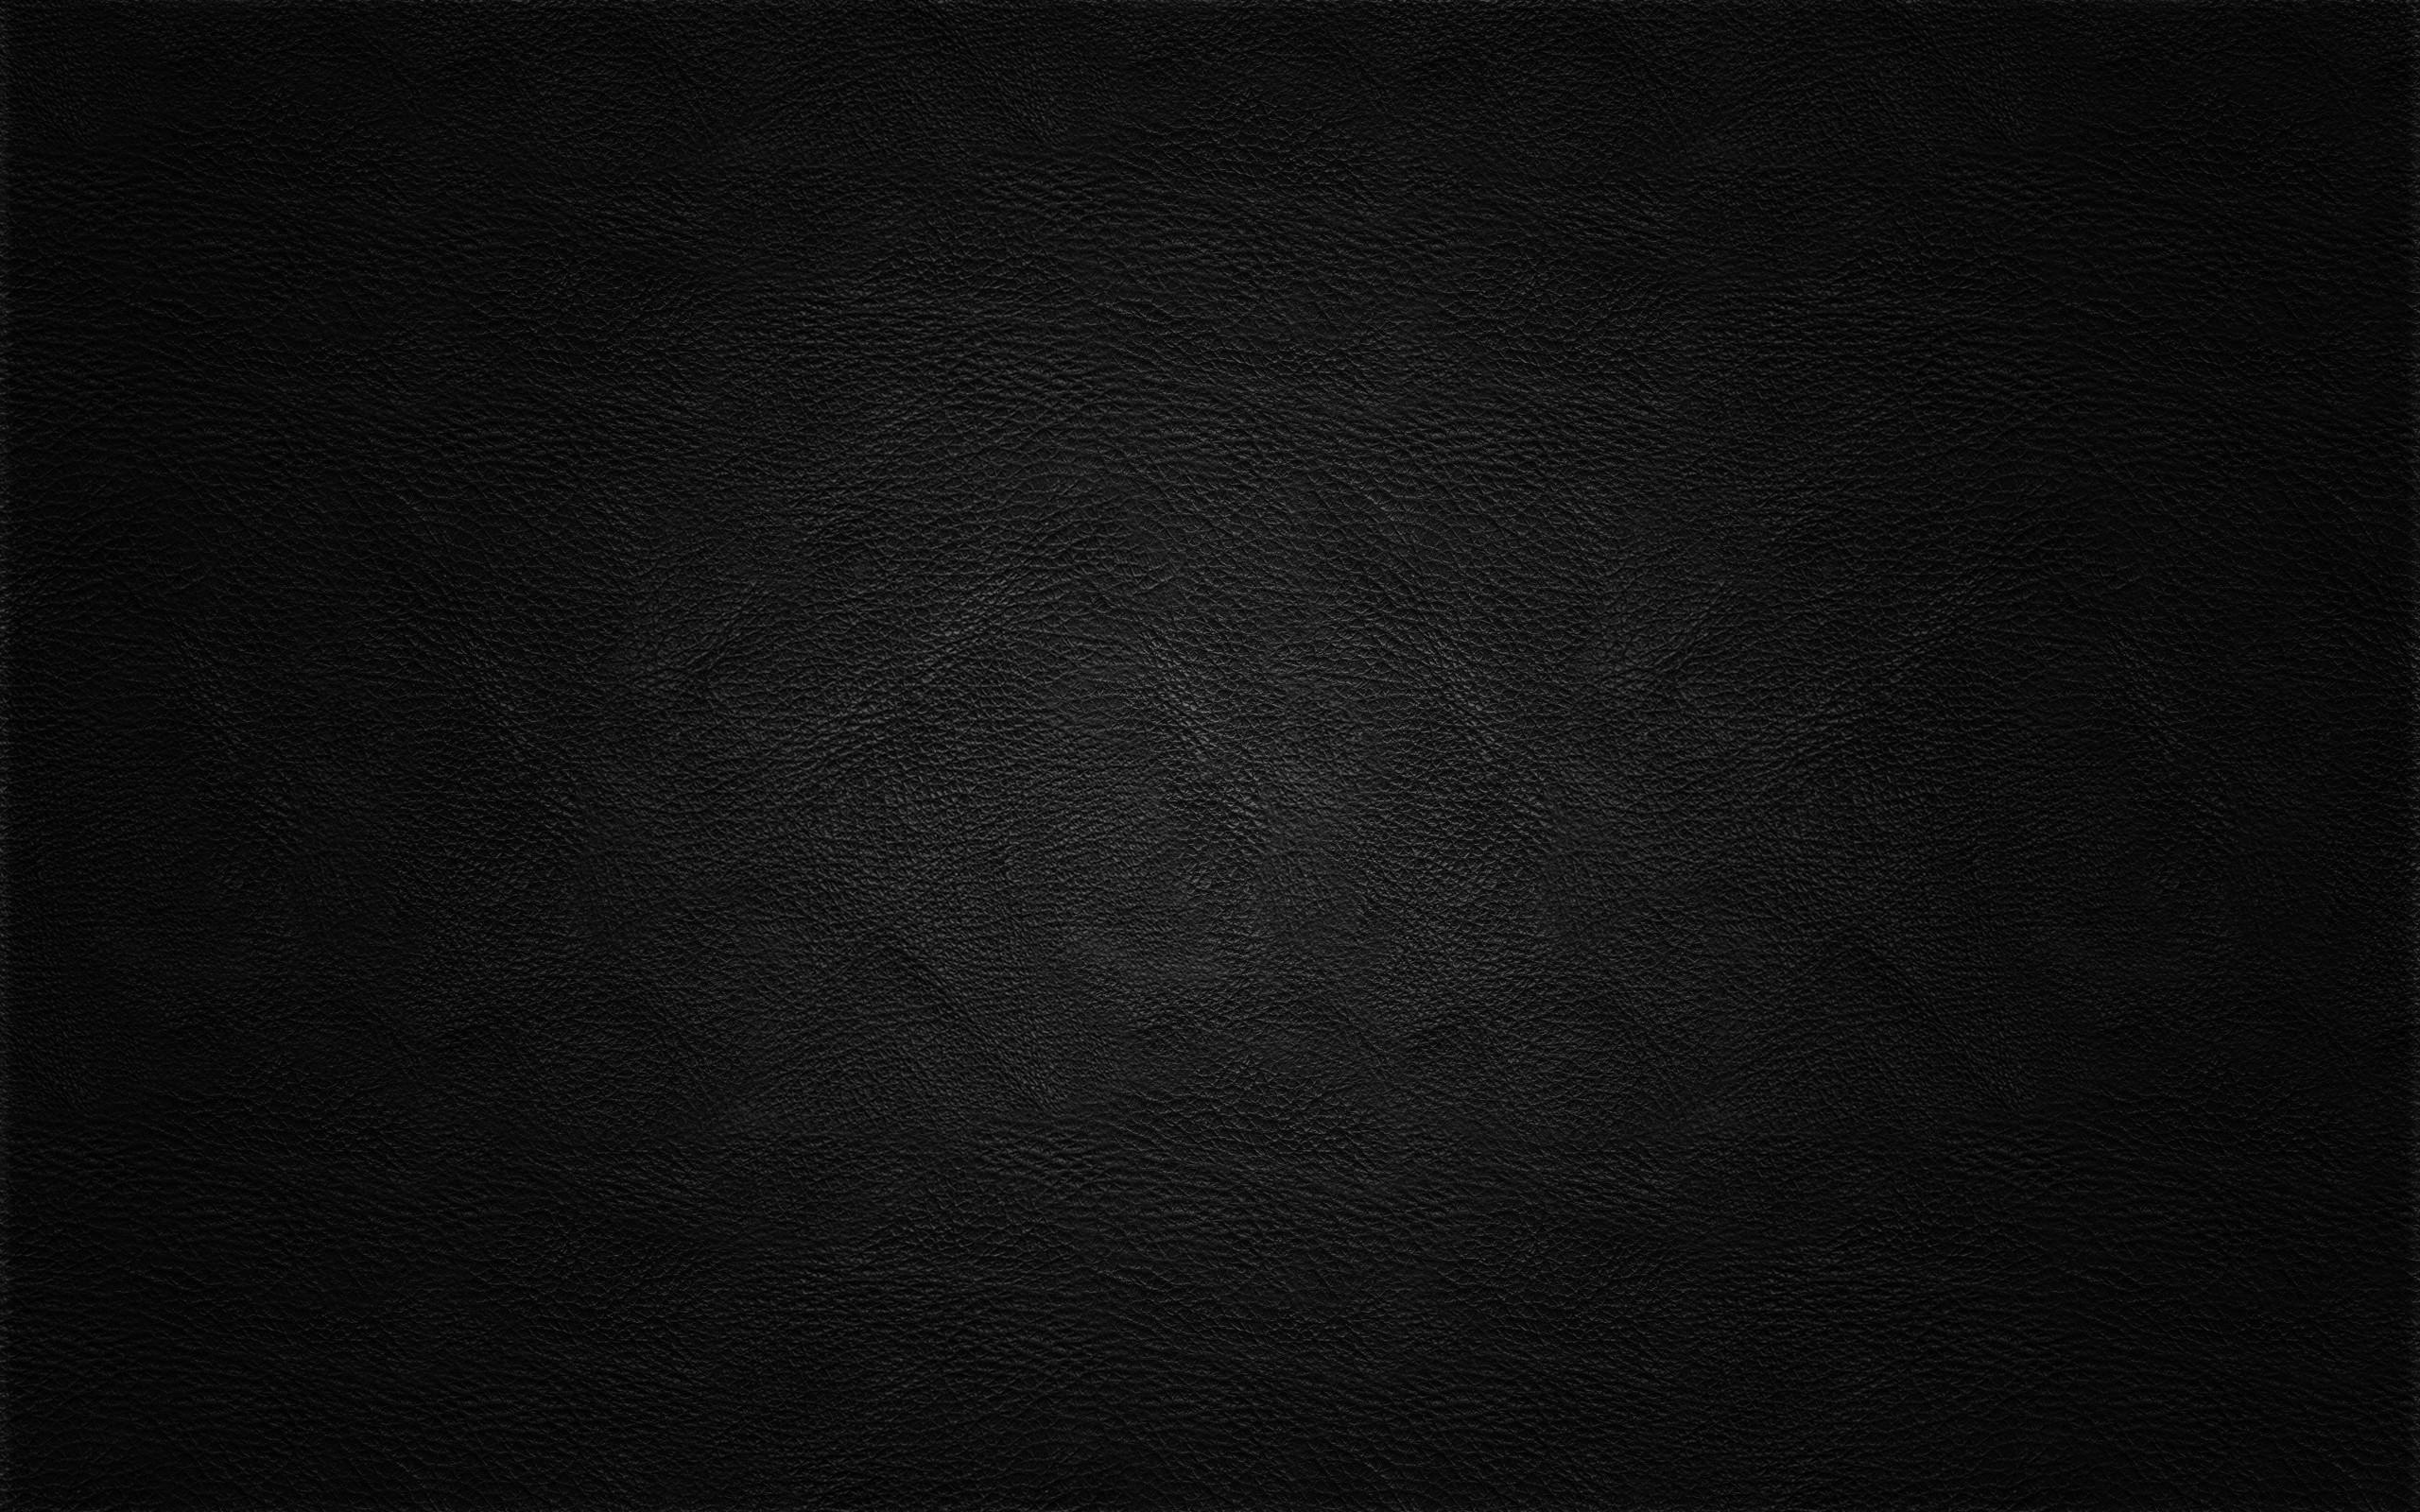 Black Leather.jpg …